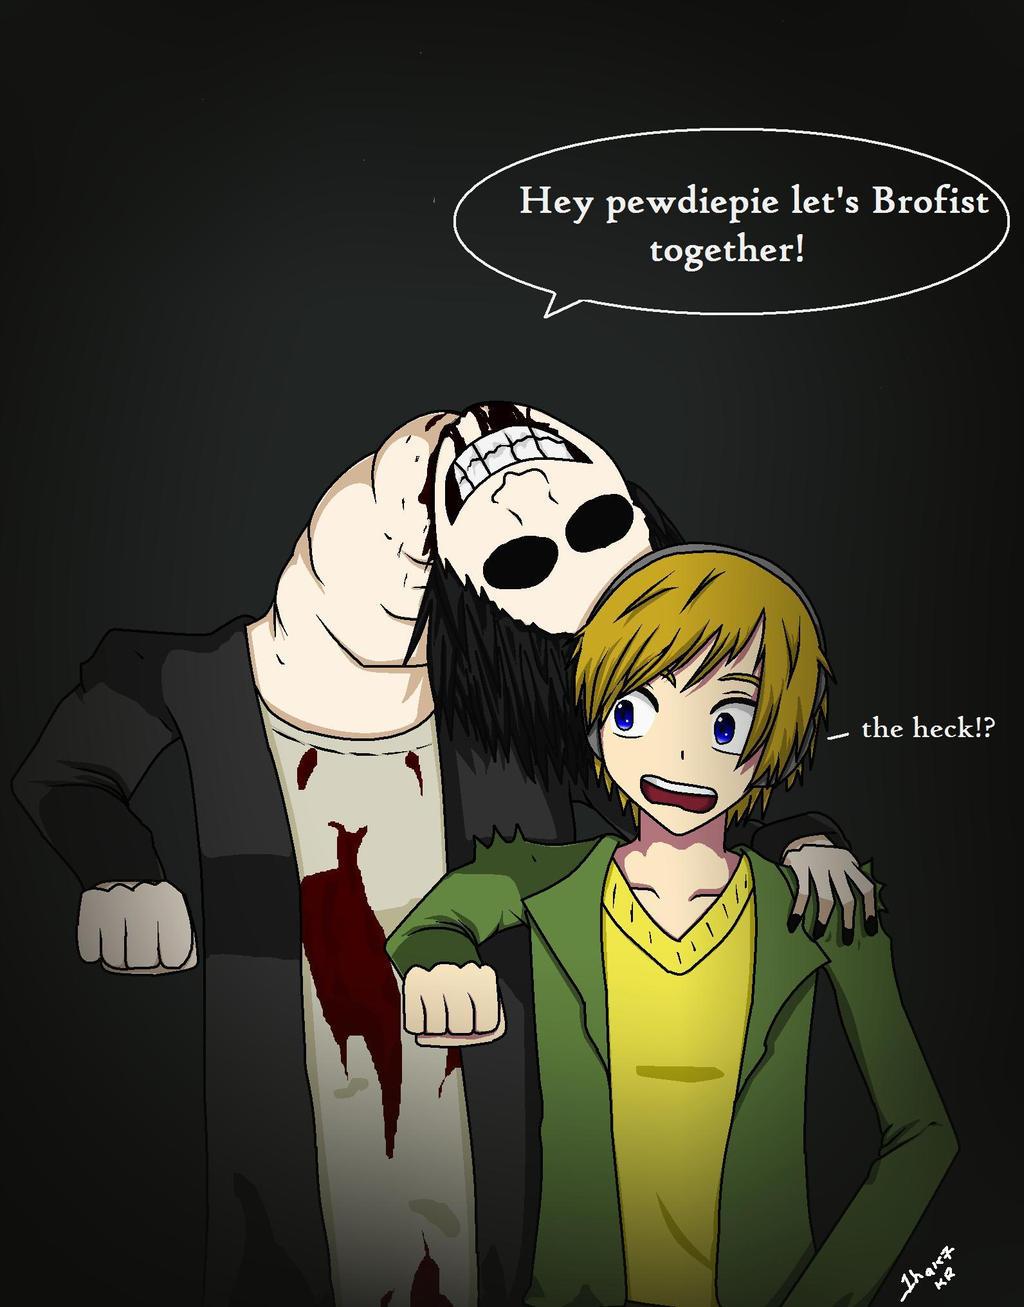 the crooked man and pewdiepie brofist by 1haku7 on deviantart